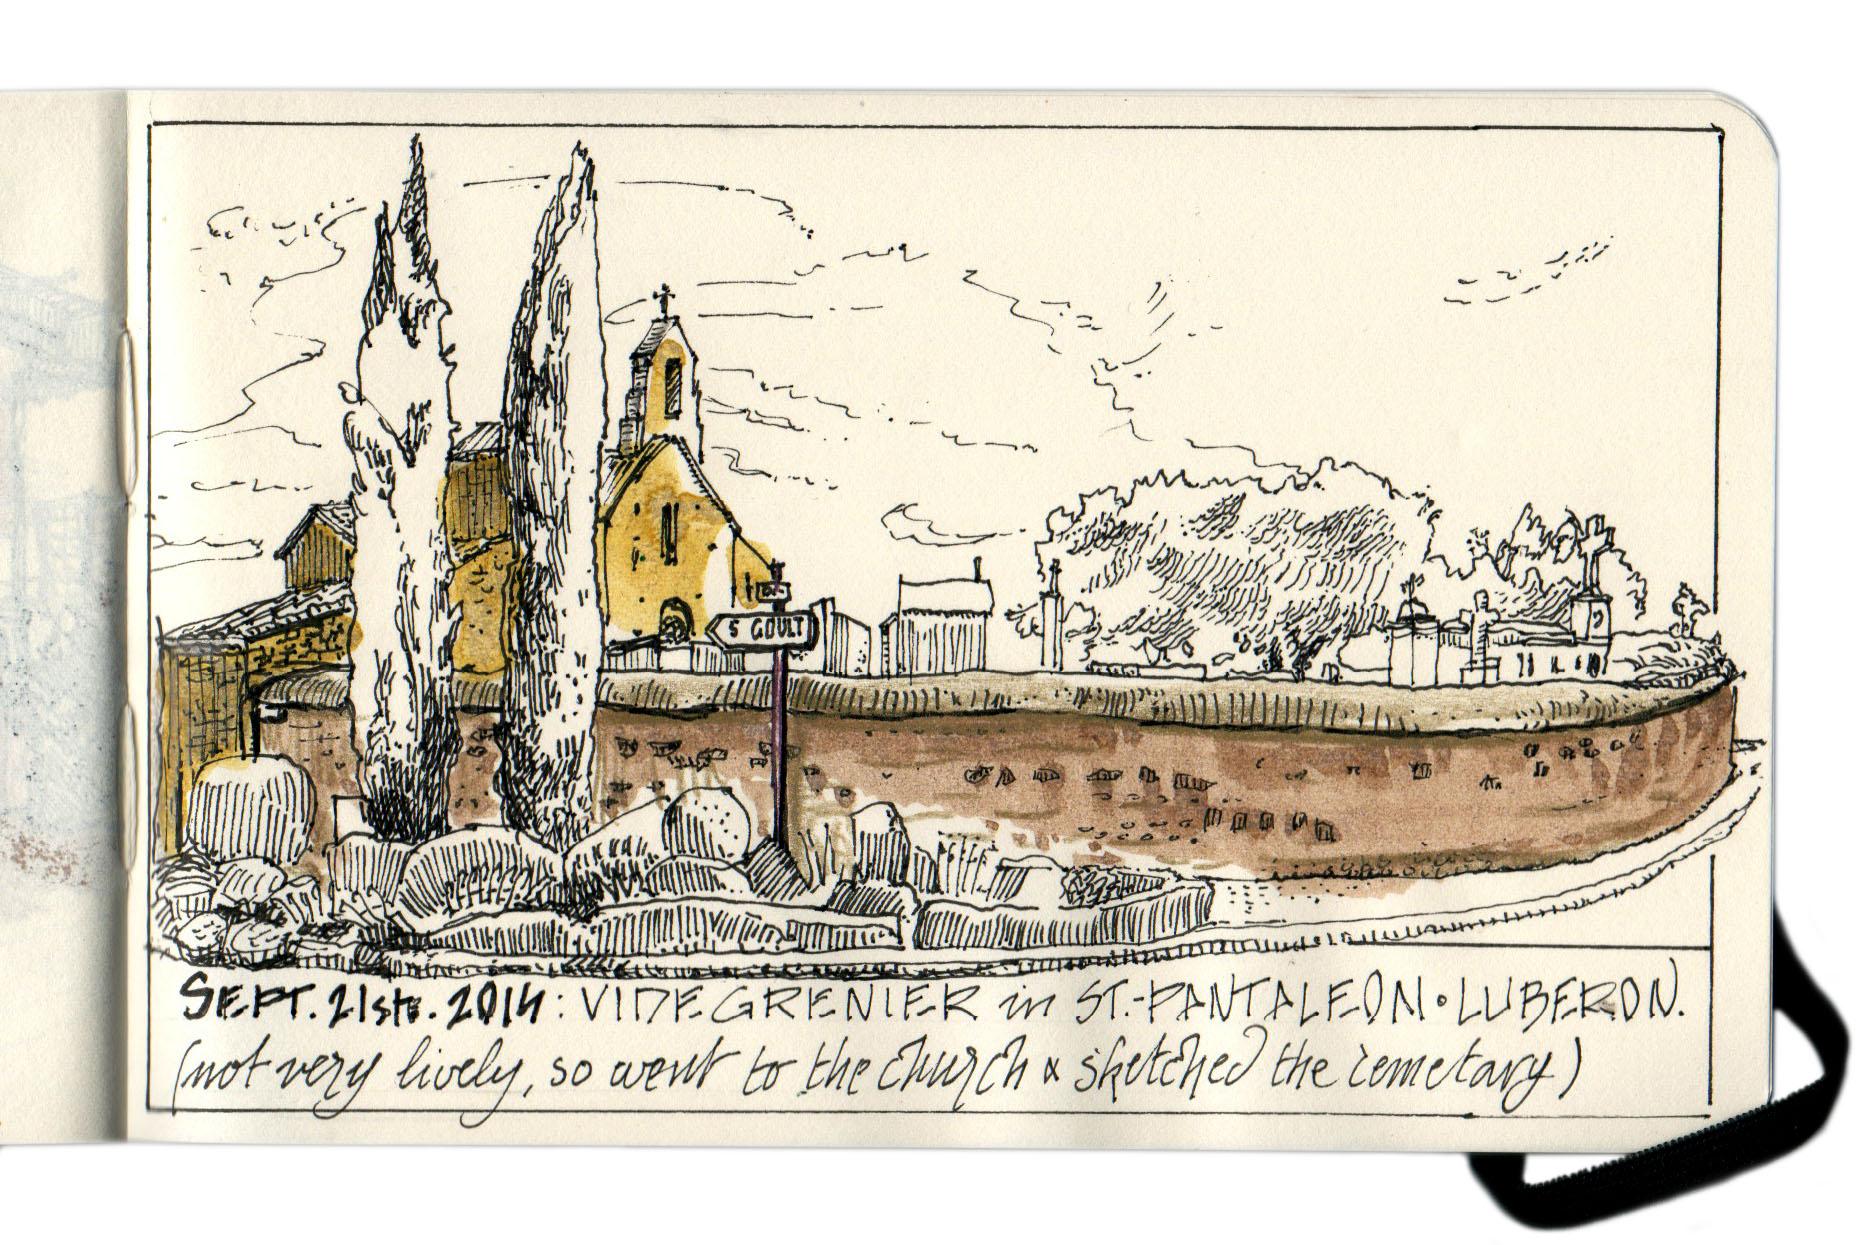 Vide grenier in saint pantaleon provence mymoleskine community - Vide grenier salon de provence ...